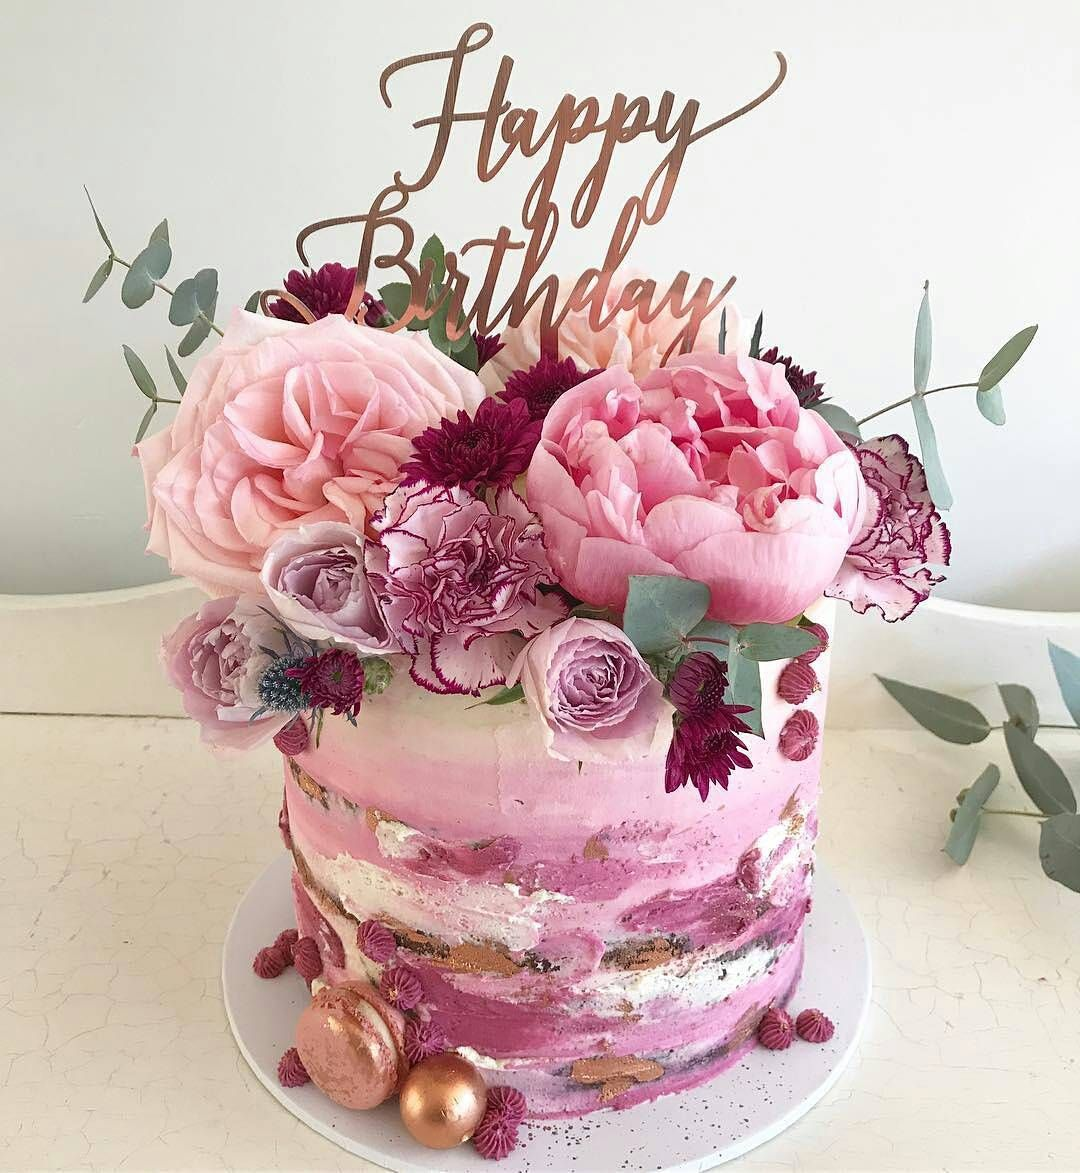 Aust cake decorating network on instagram